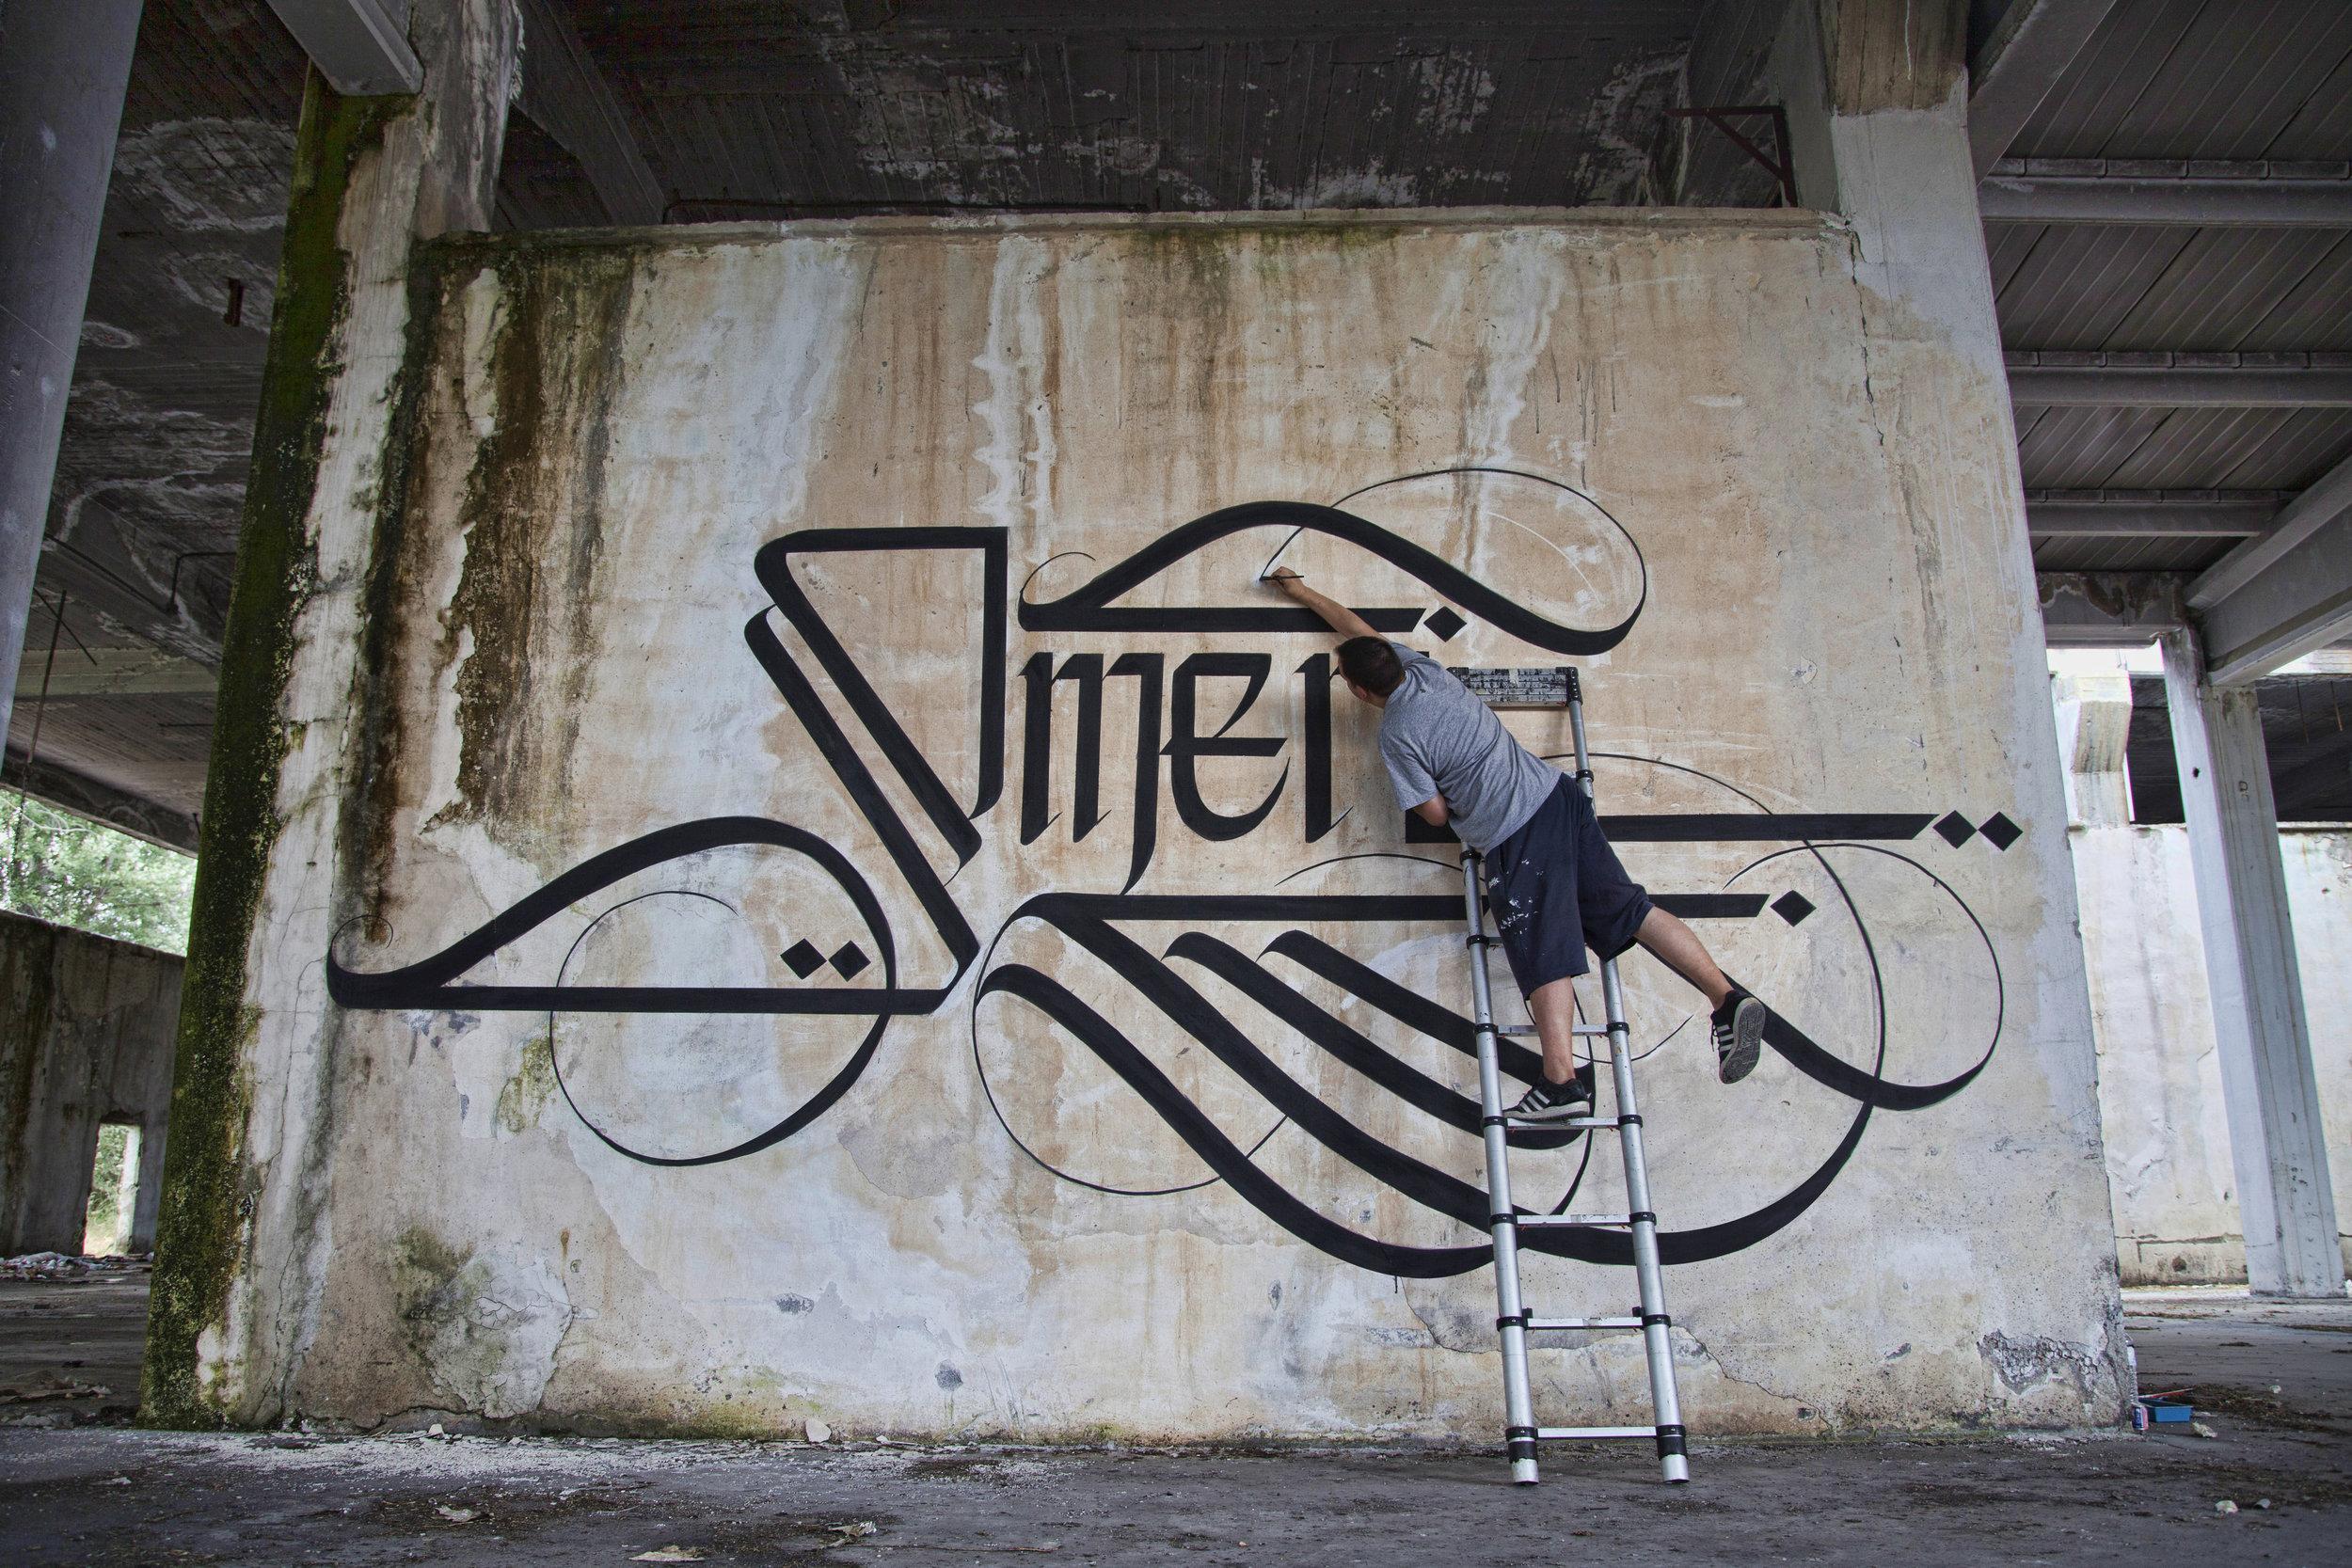 urban_calligraphy_simon_silaidis_omen_02.JPG